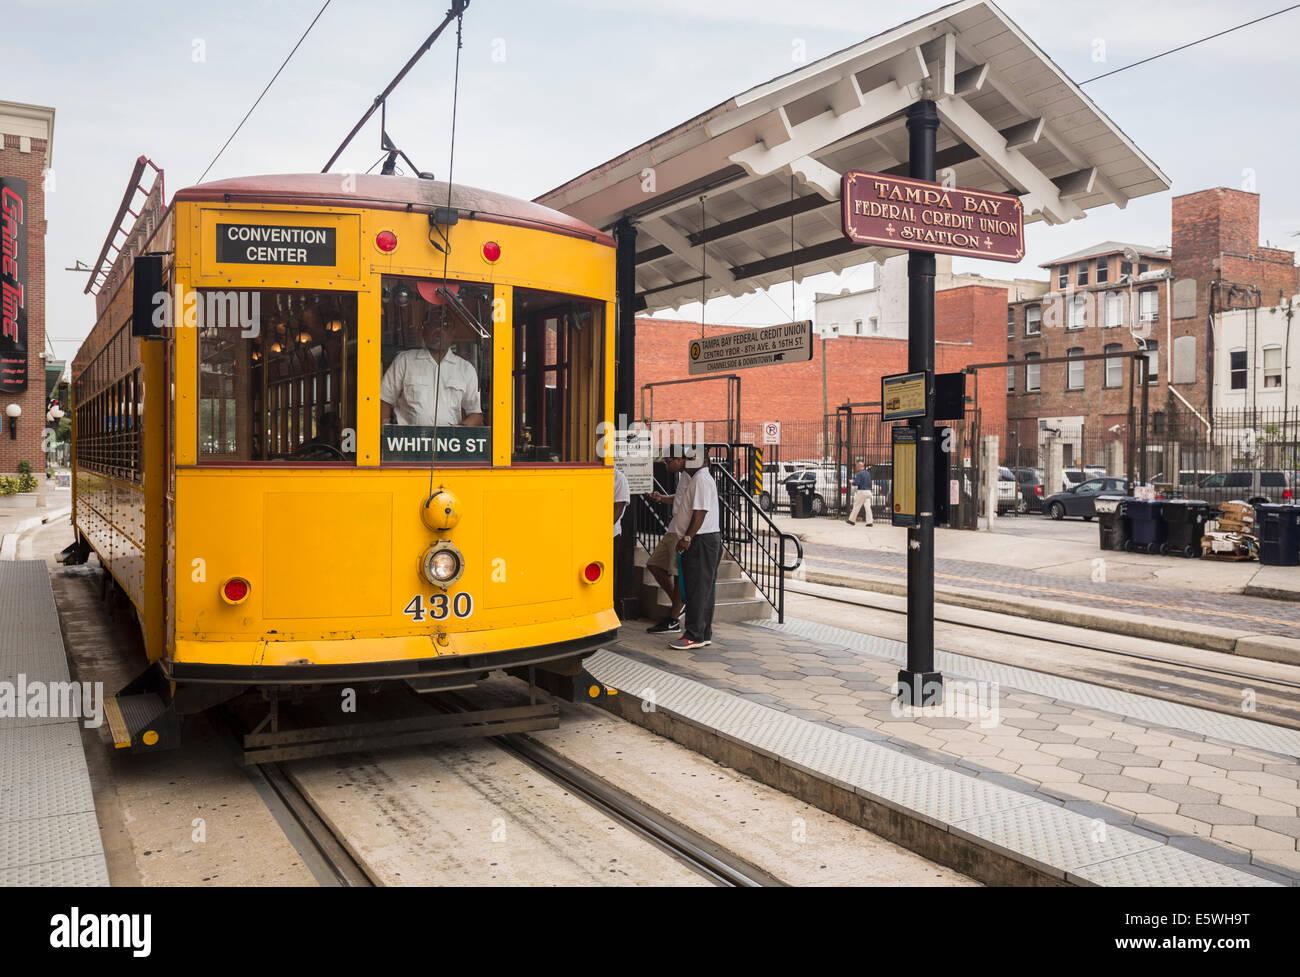 TECO Railcar tramway train in modern station in Ybor City, Tampa, Florida, USA - Stock Image